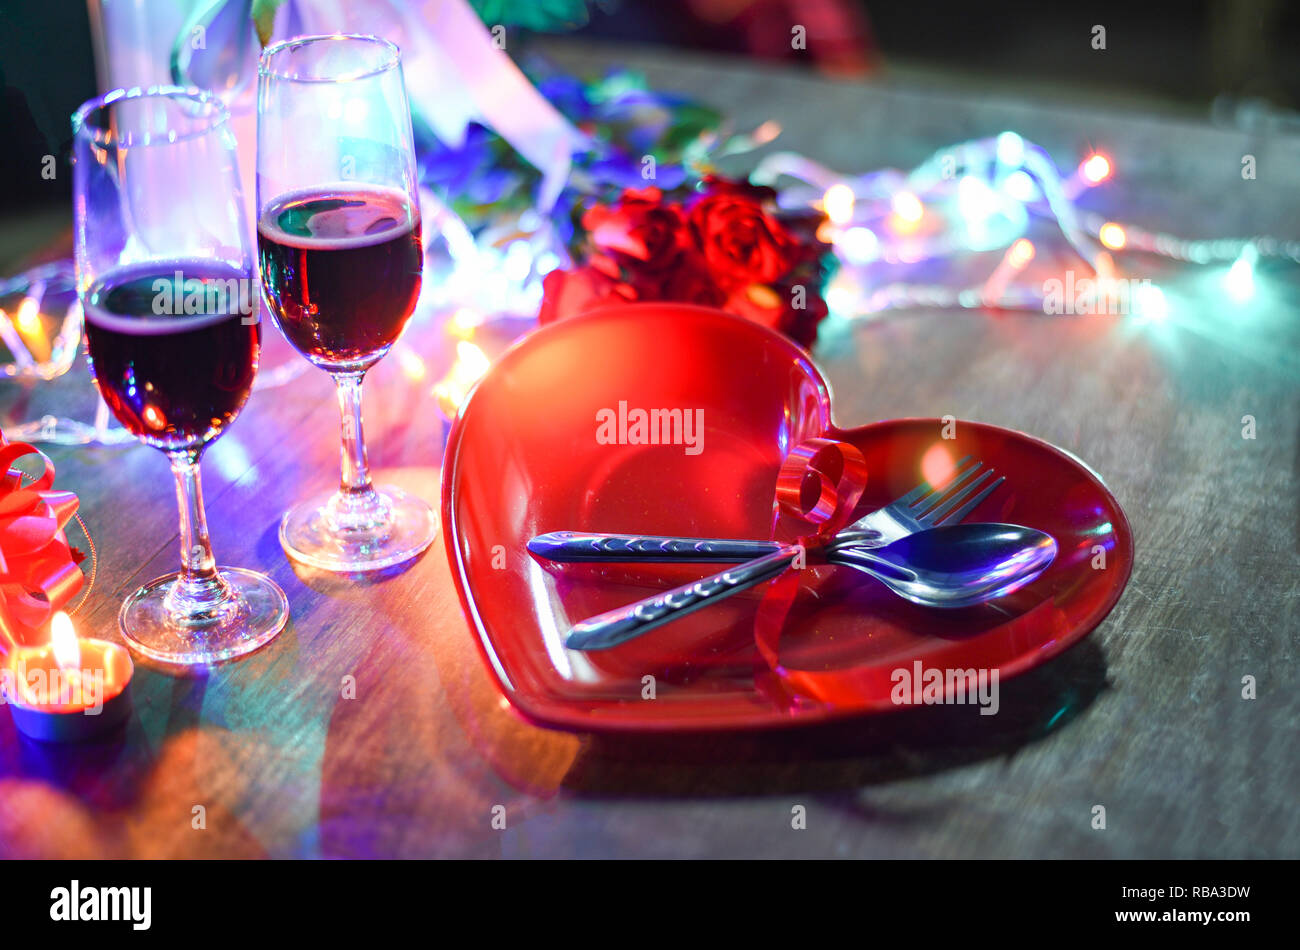 Día De San Valentín Cena Romántica Del Amor Romántico